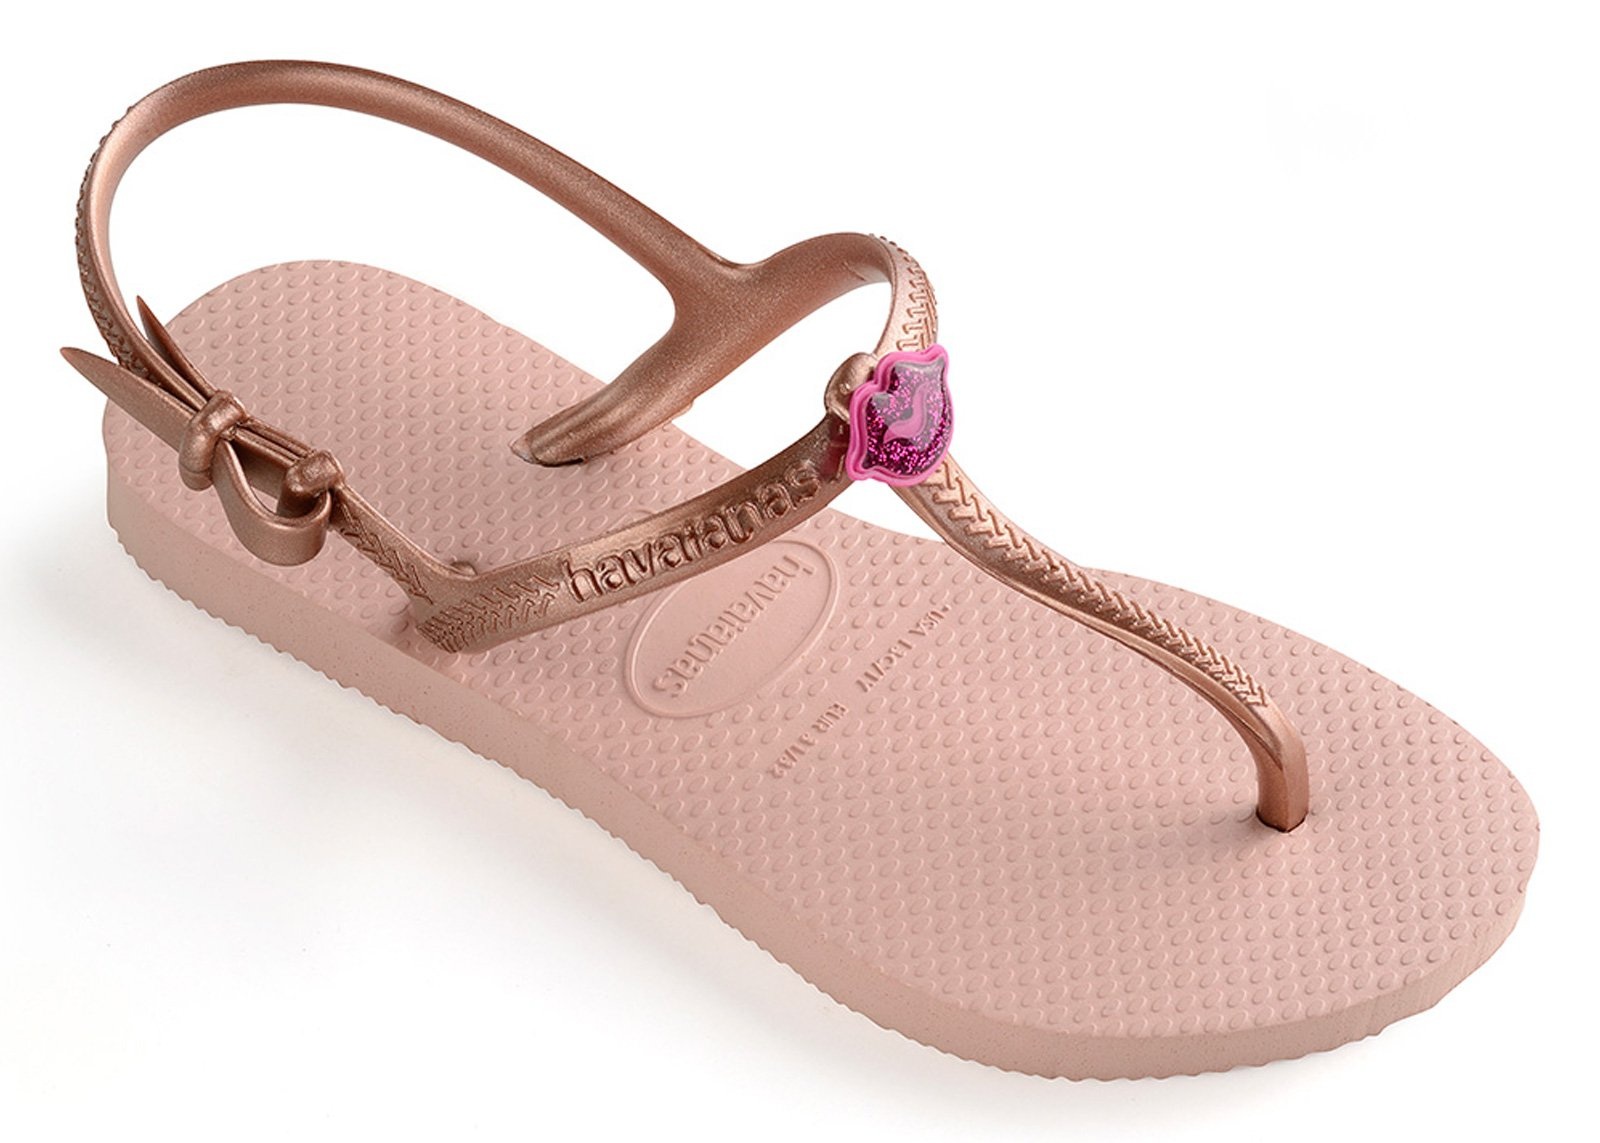 aafea19540d499 Flip-Flops Kids Freedom Ballet Rose - Brand Havaianas